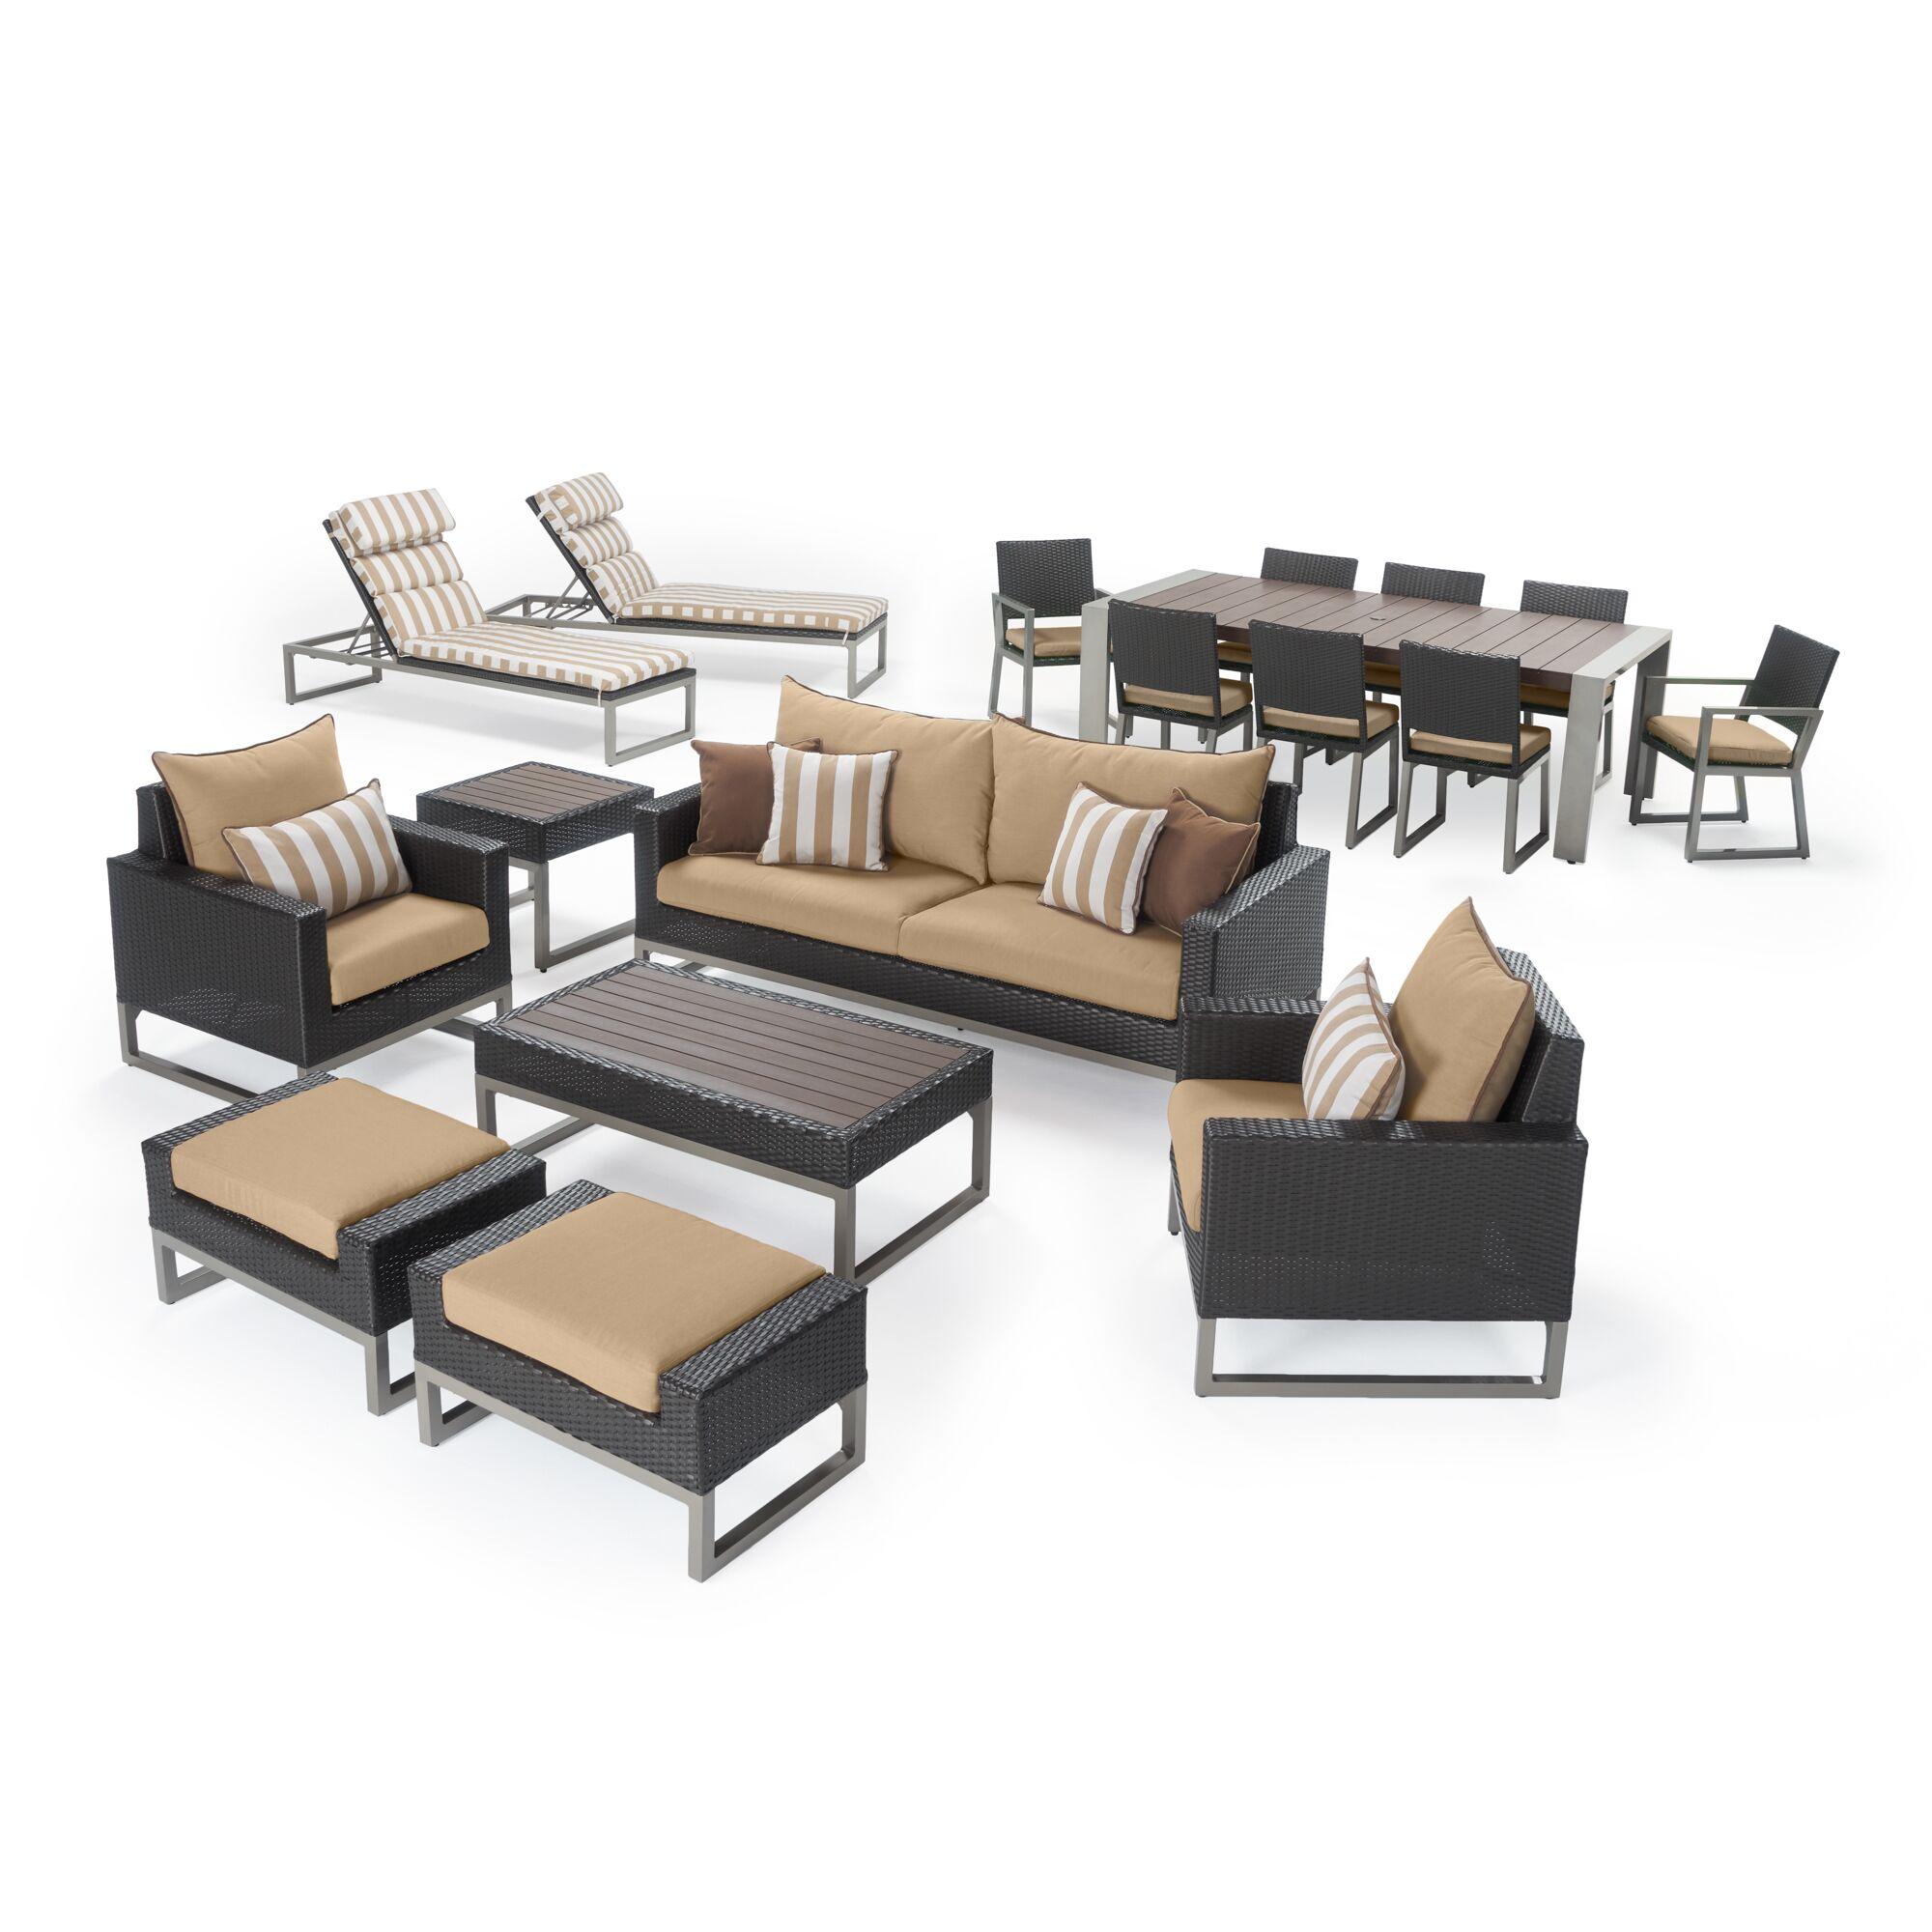 Gary 18 Piece Rattan Sunbrella Complete Patio Set with Cushions Frame Finish: Espresso